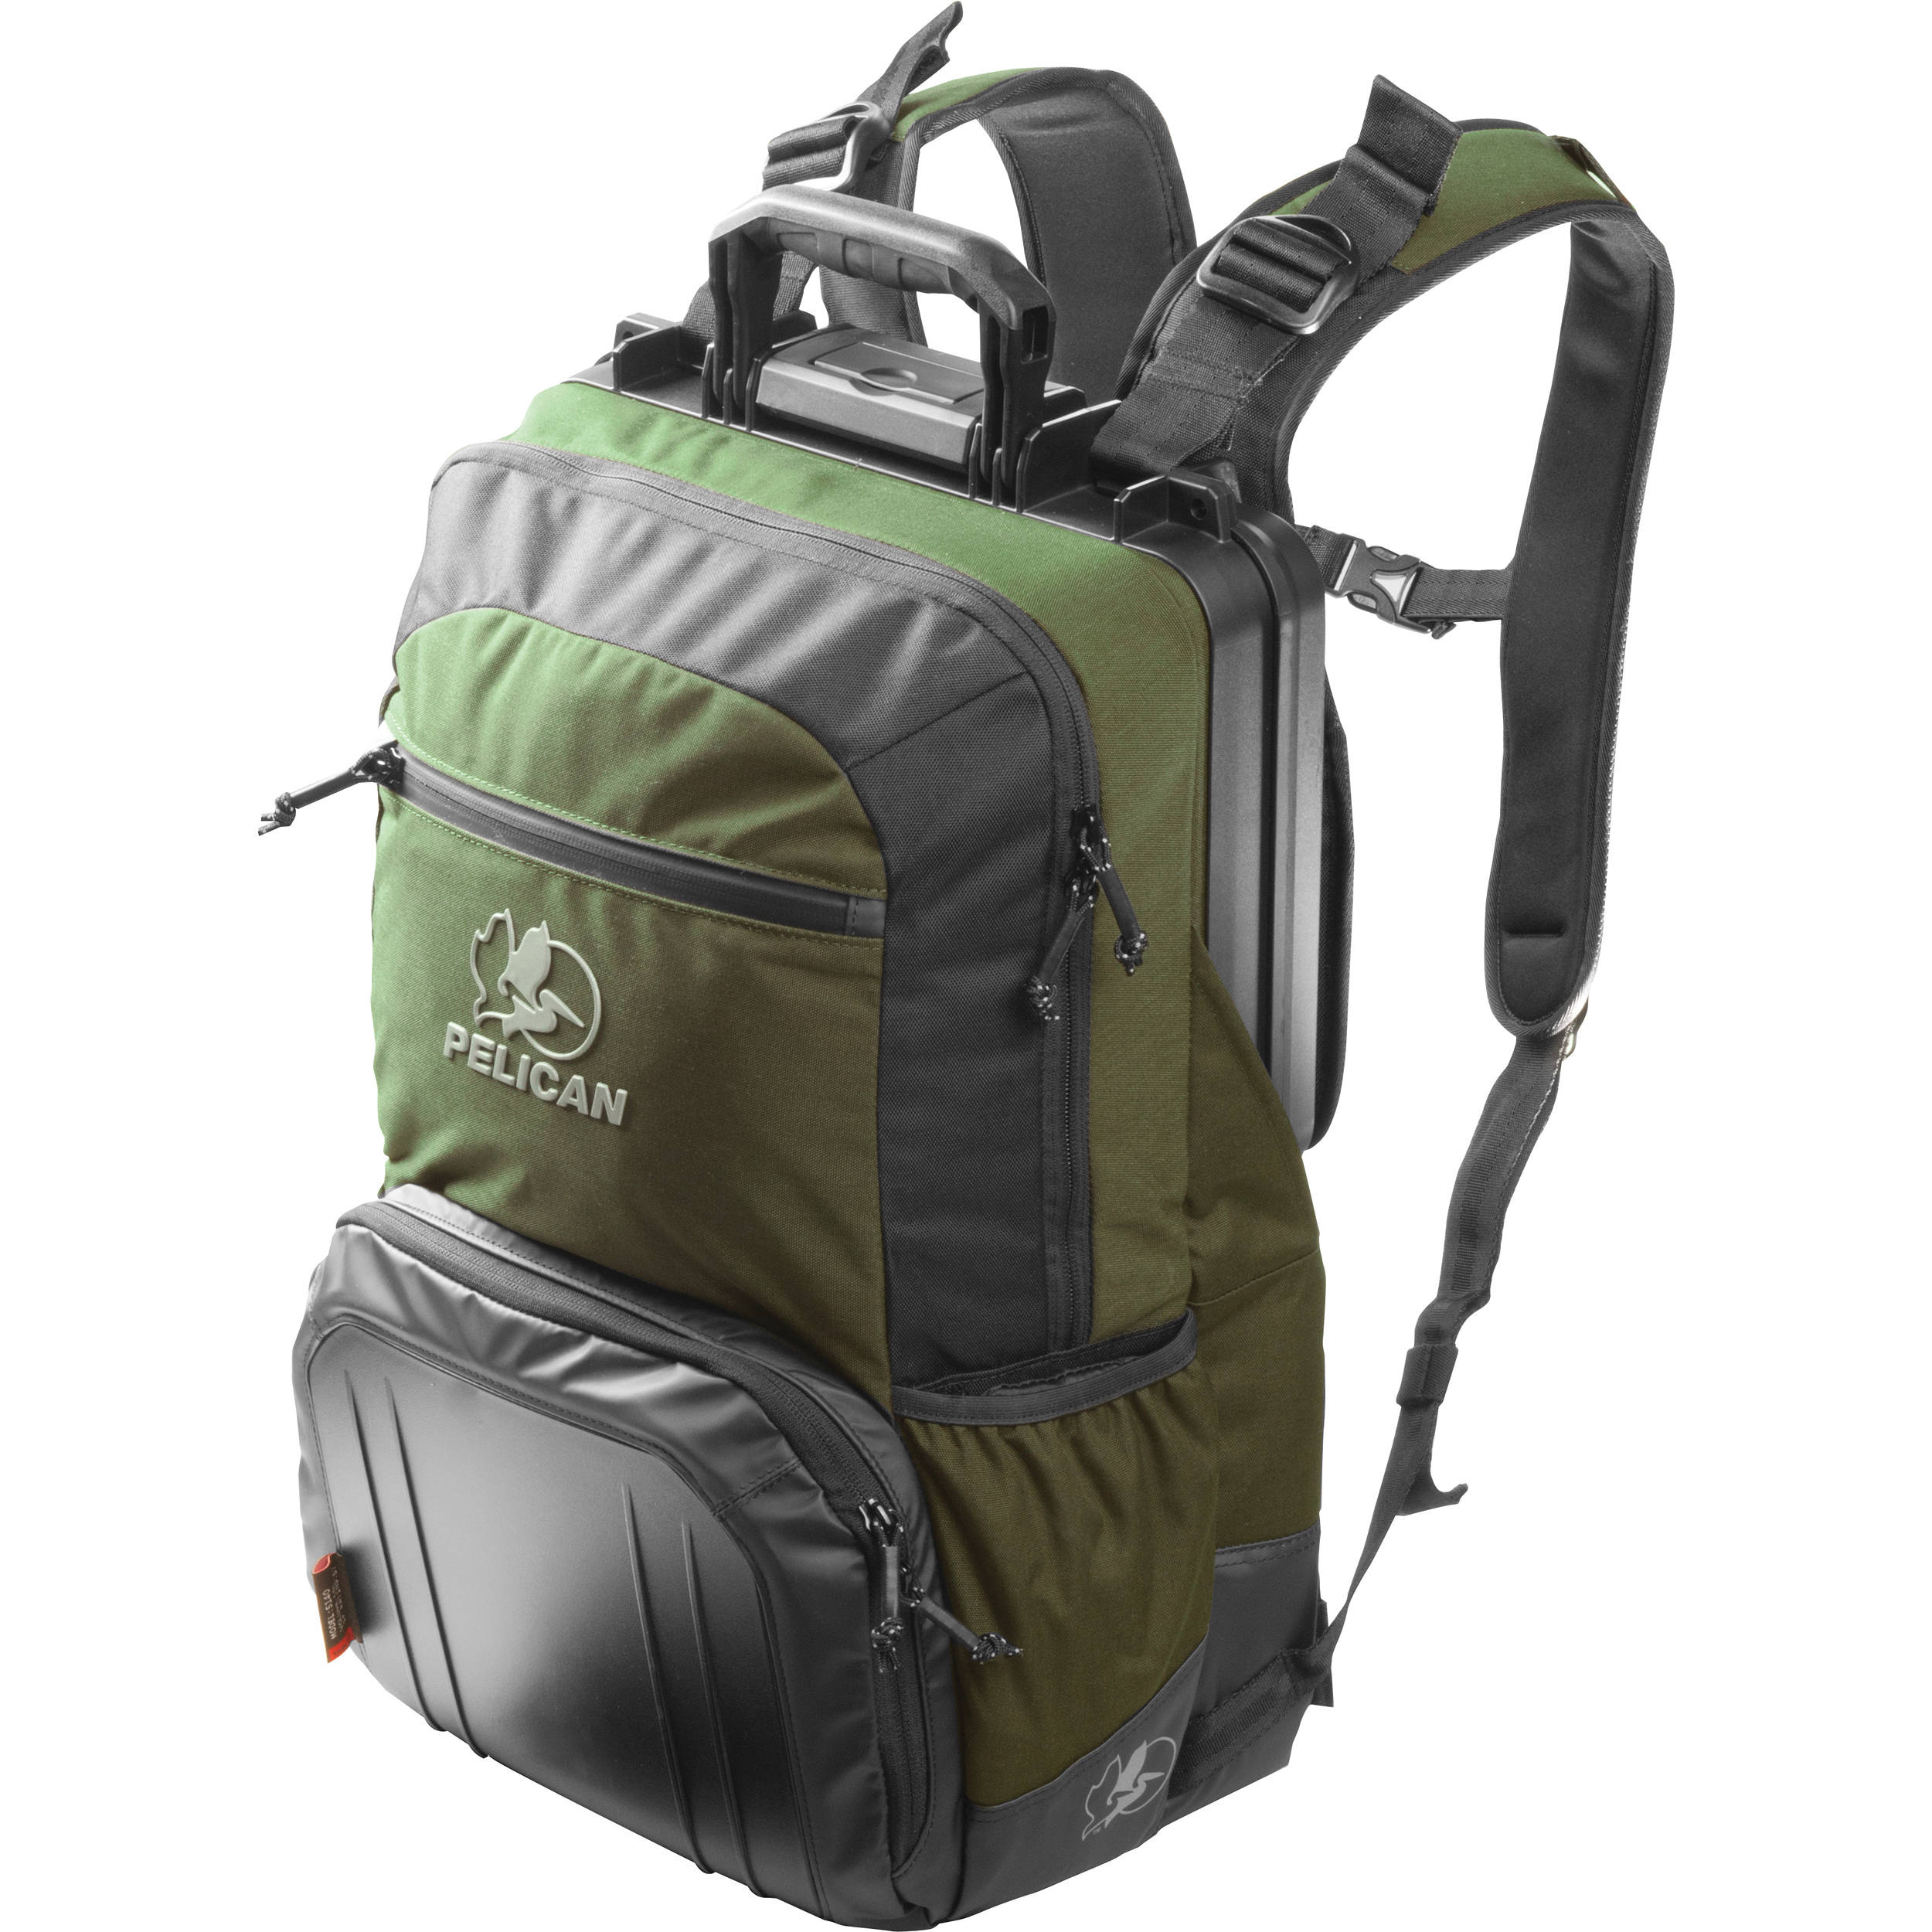 Pelican S140 Sport Elite Tablet Backpack (Green)